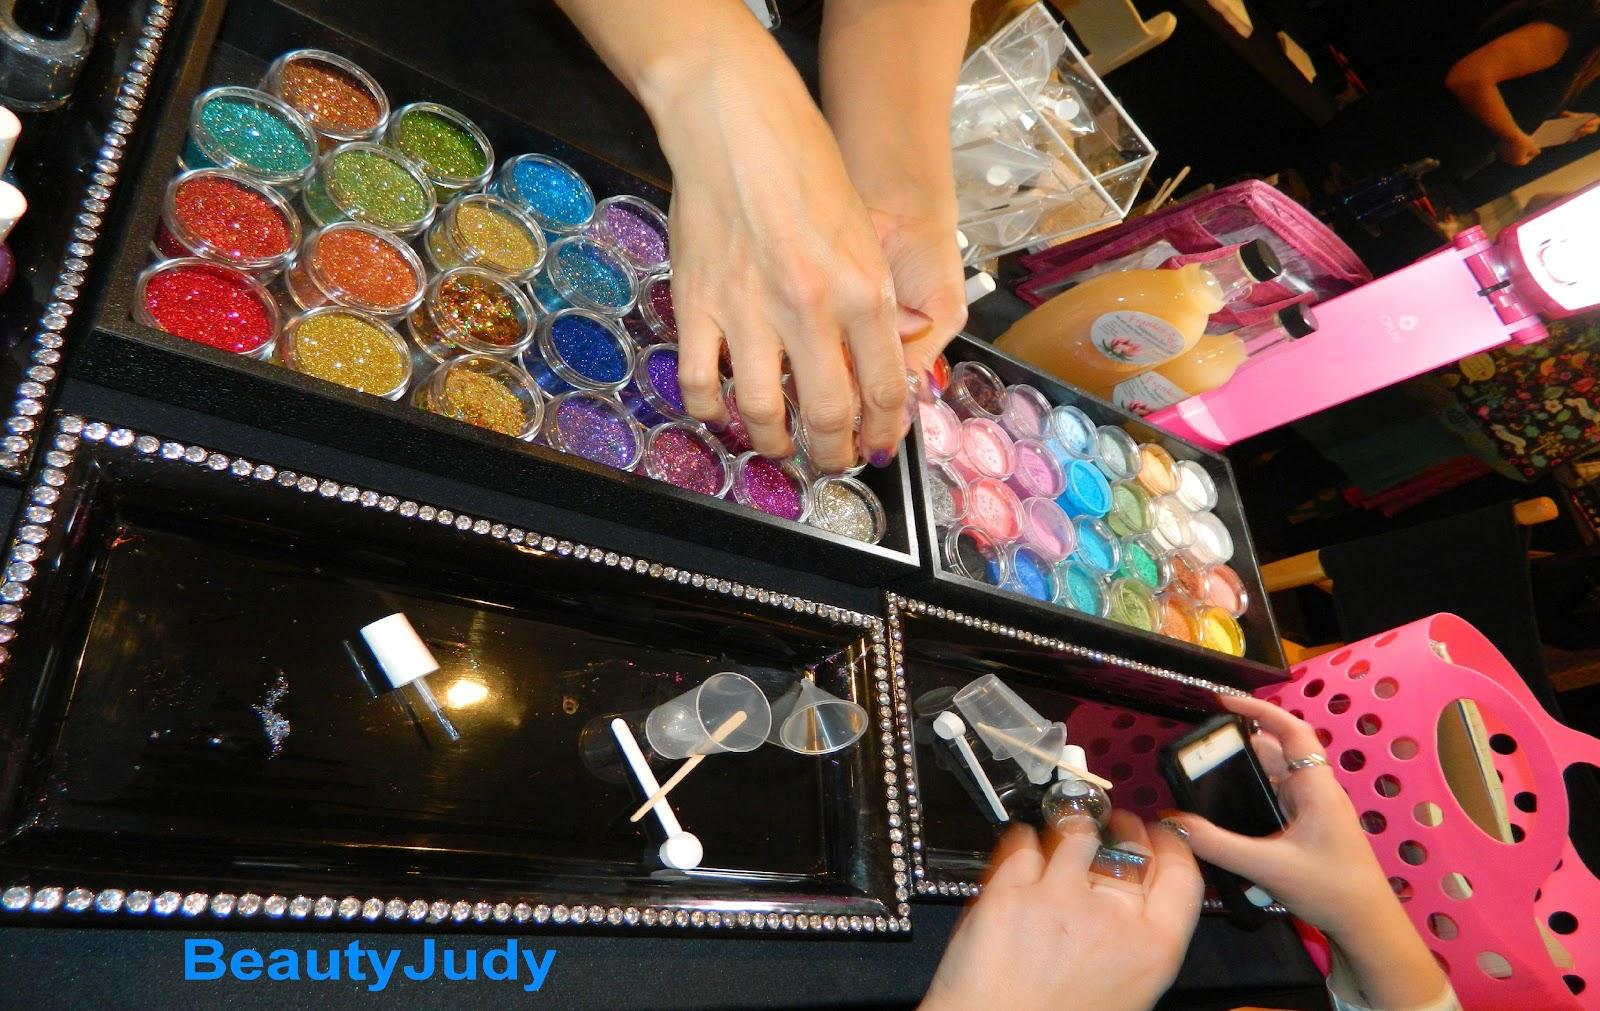 Franken Polish is coming to Amerikan Body Art » BeautyJudy